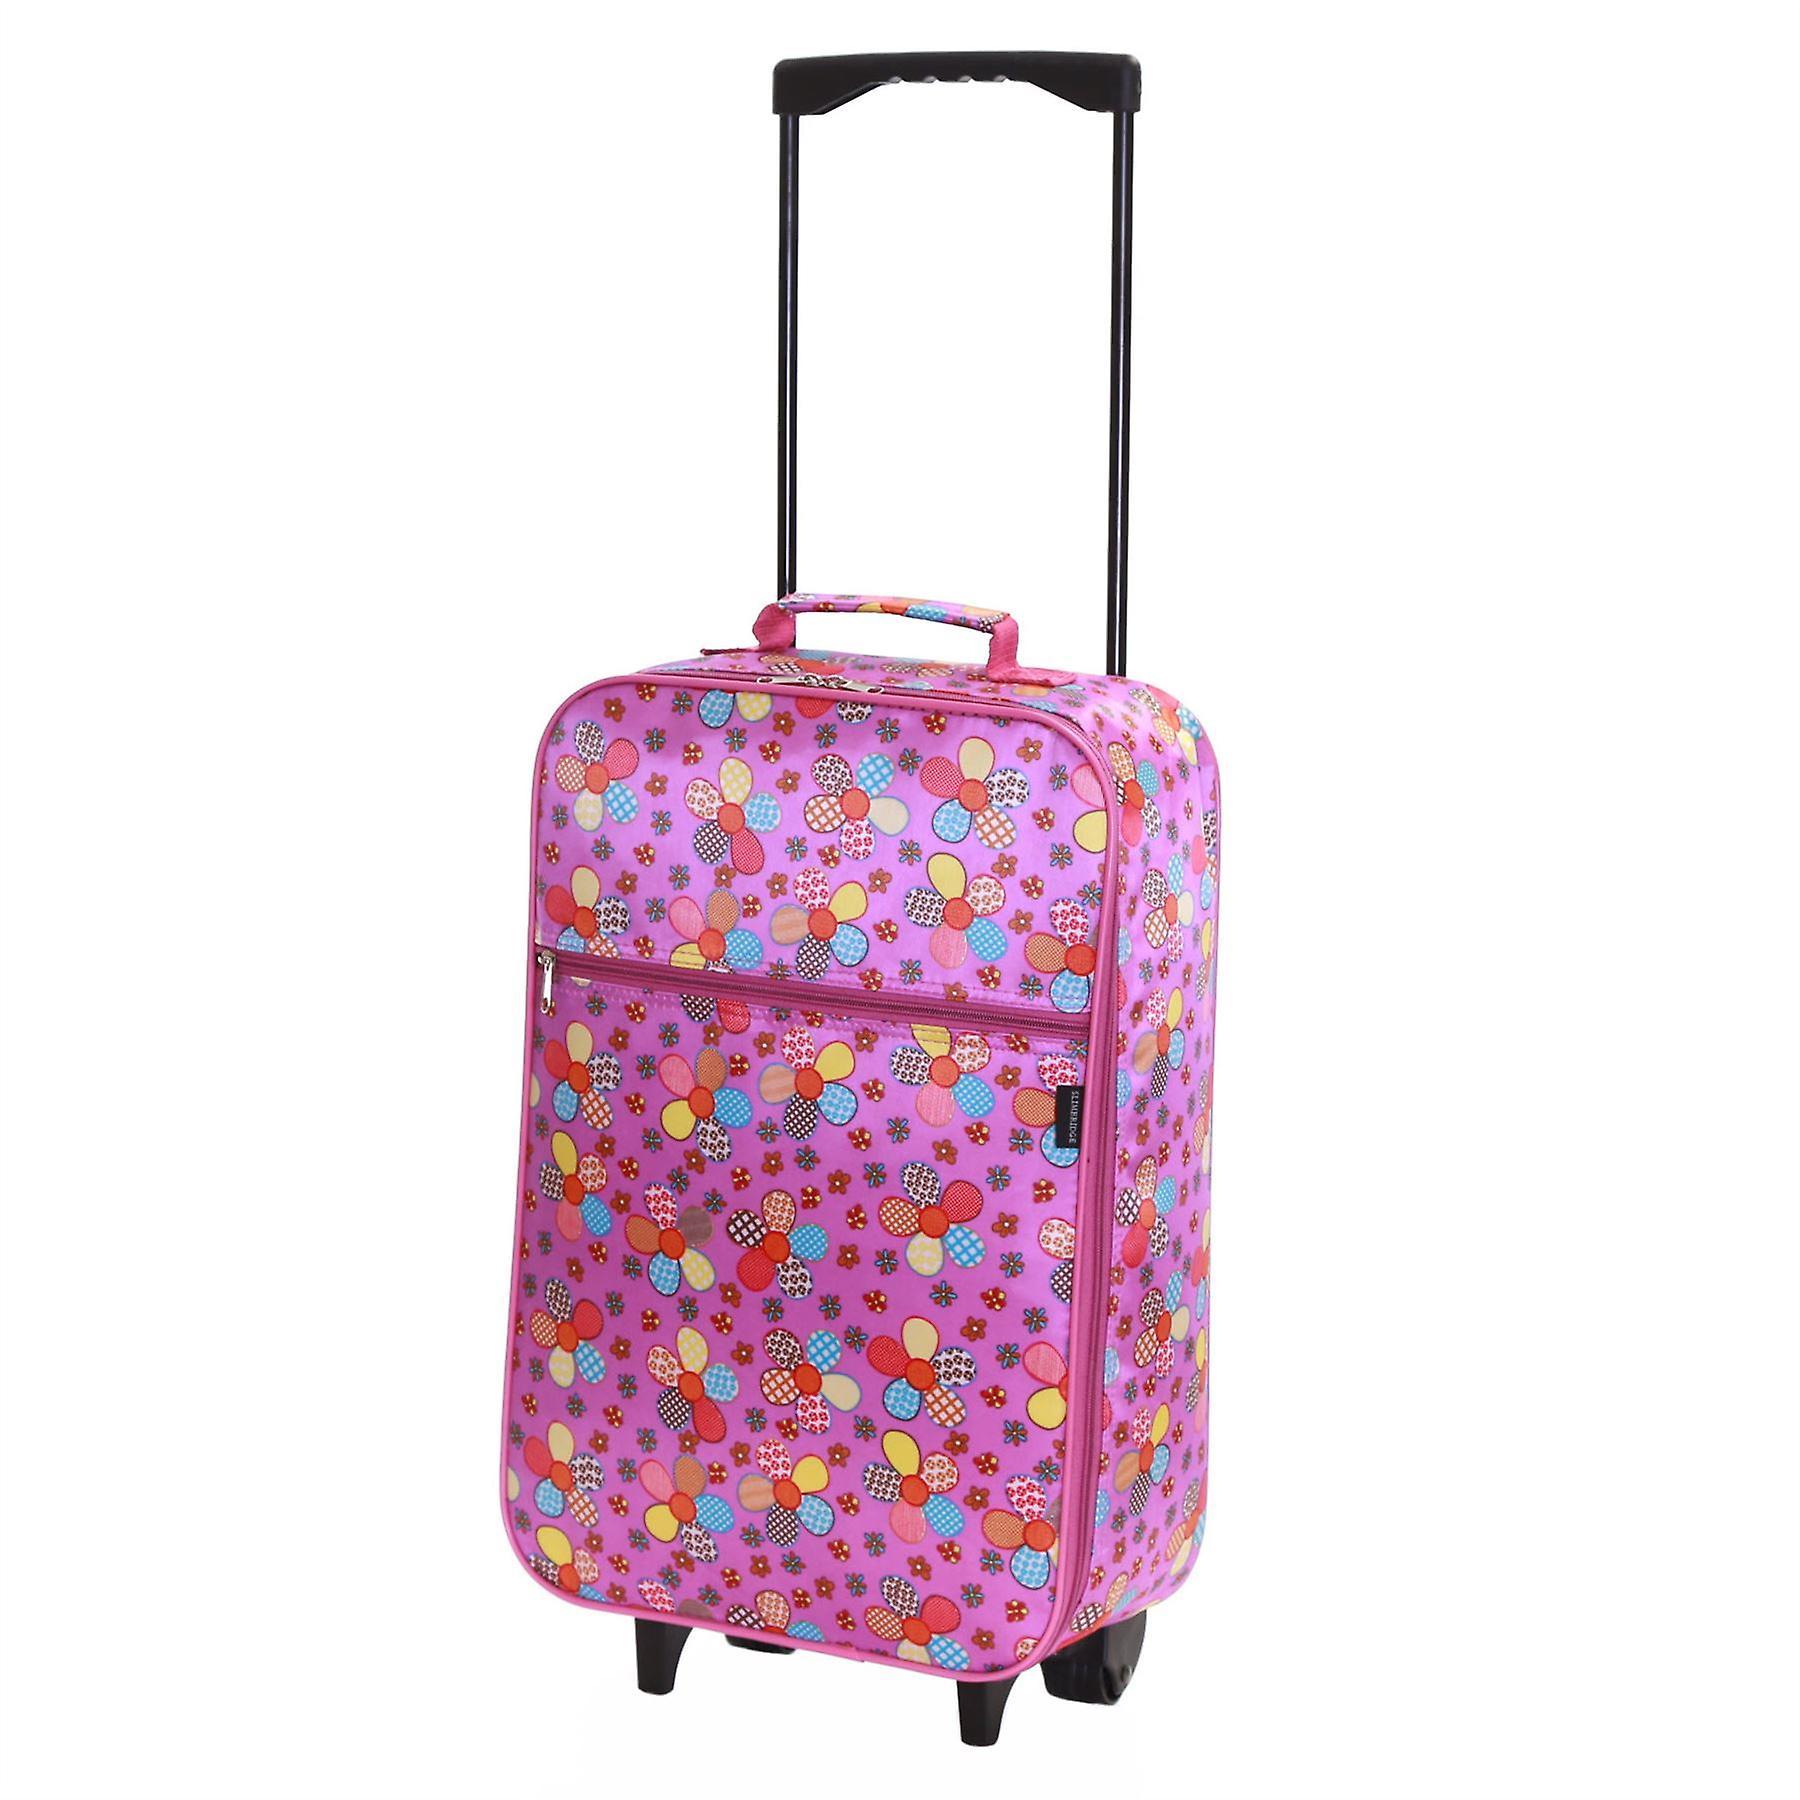 Slimbridge Barcelona Kids Cabin Approved Bag, Lilac Flowers